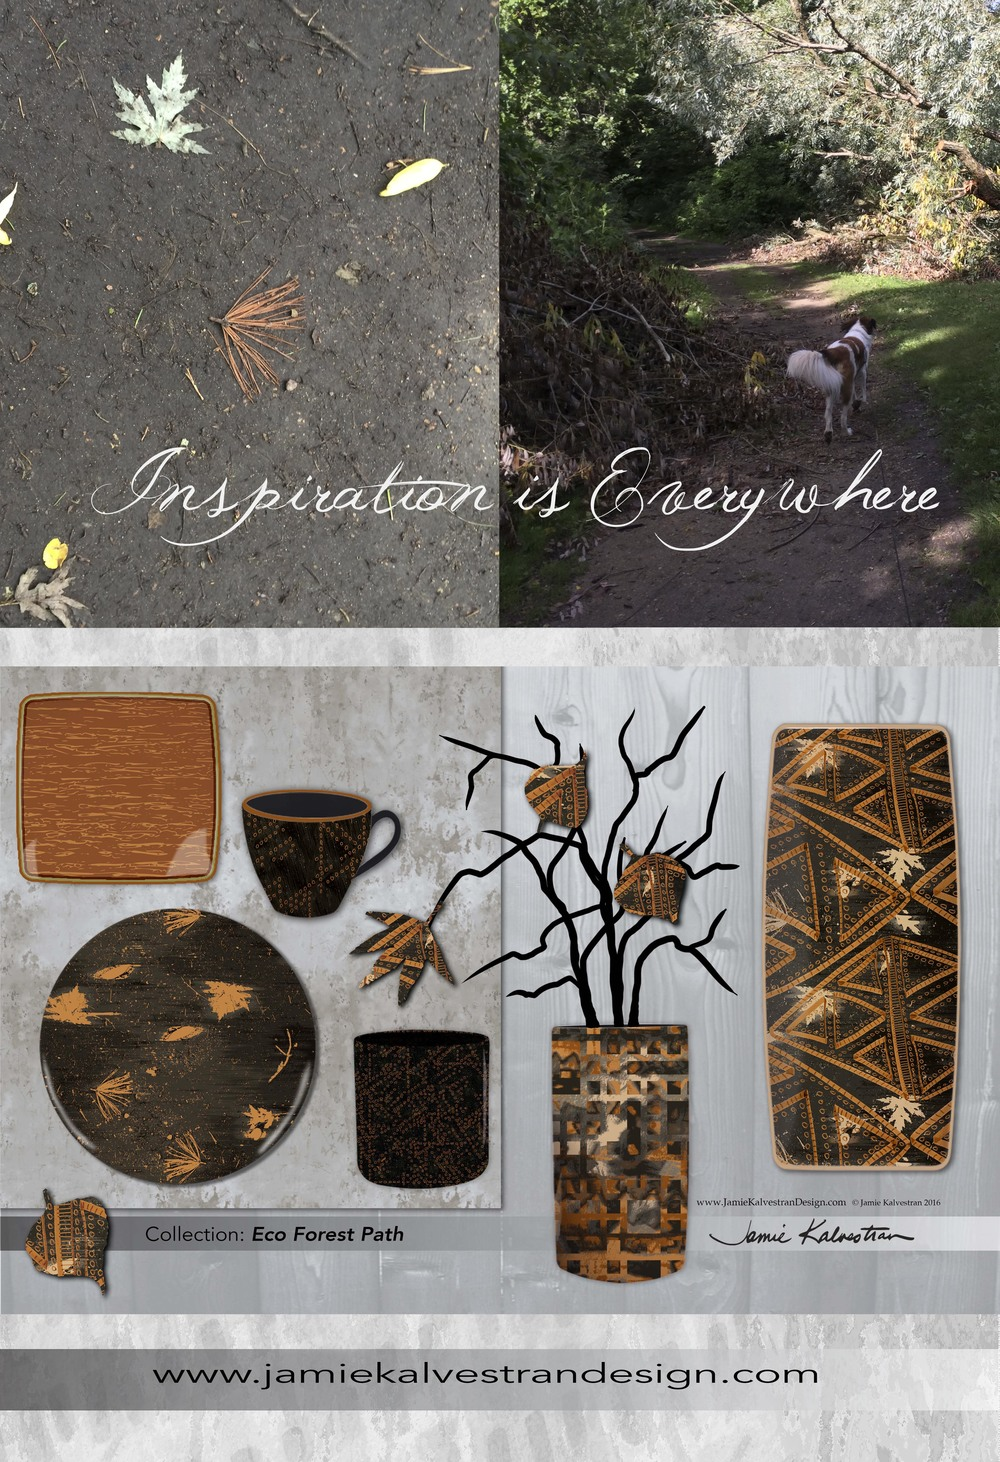 Eco_Forest_Path-Inspiration-Jamie_Kalvestran.jpg